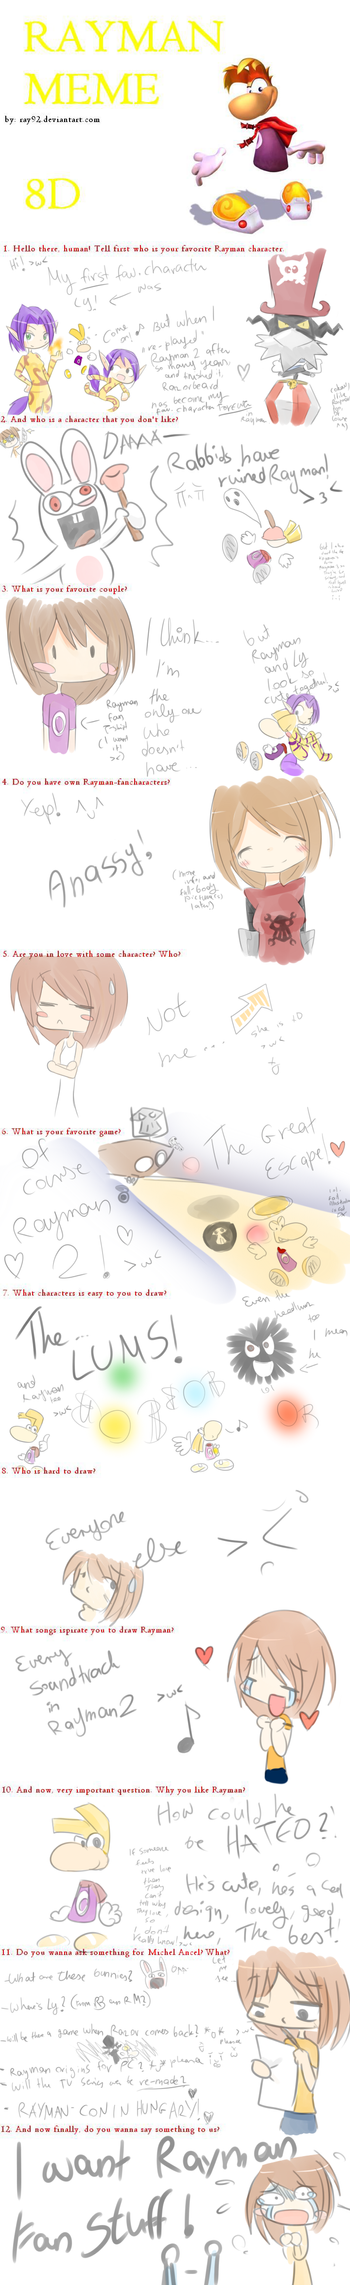 Rayman meme -filled- by ANZU-0